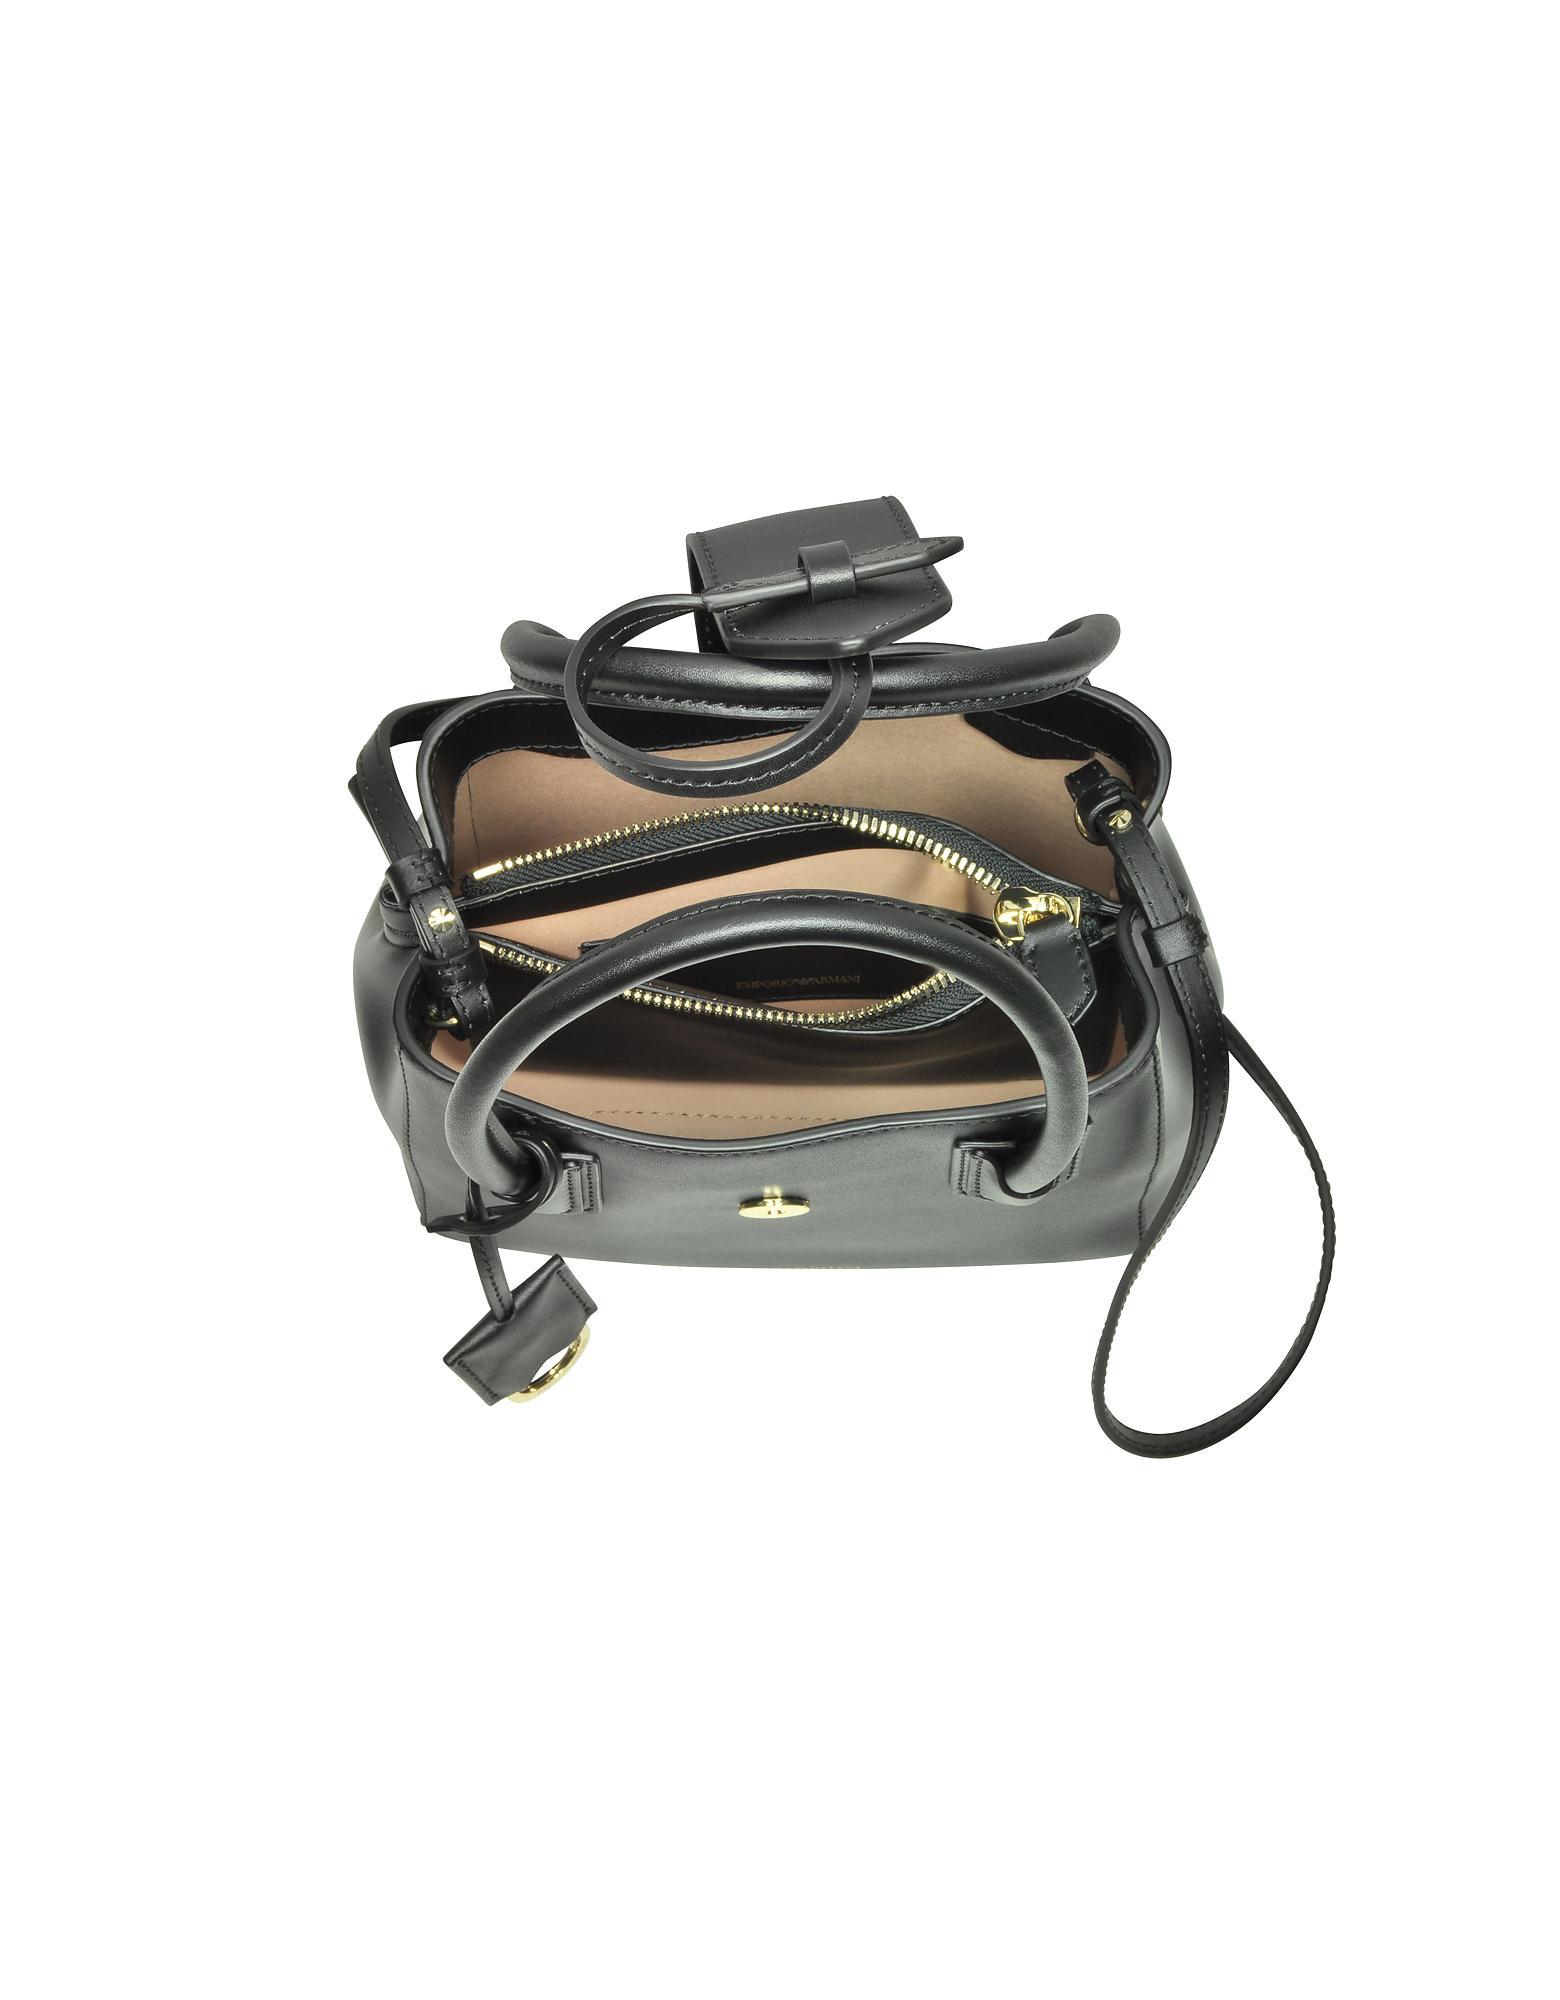 da130fab0d79 Emporio Armani - Black Genuine Leather Satchel Bag - Lyst. View fullscreen